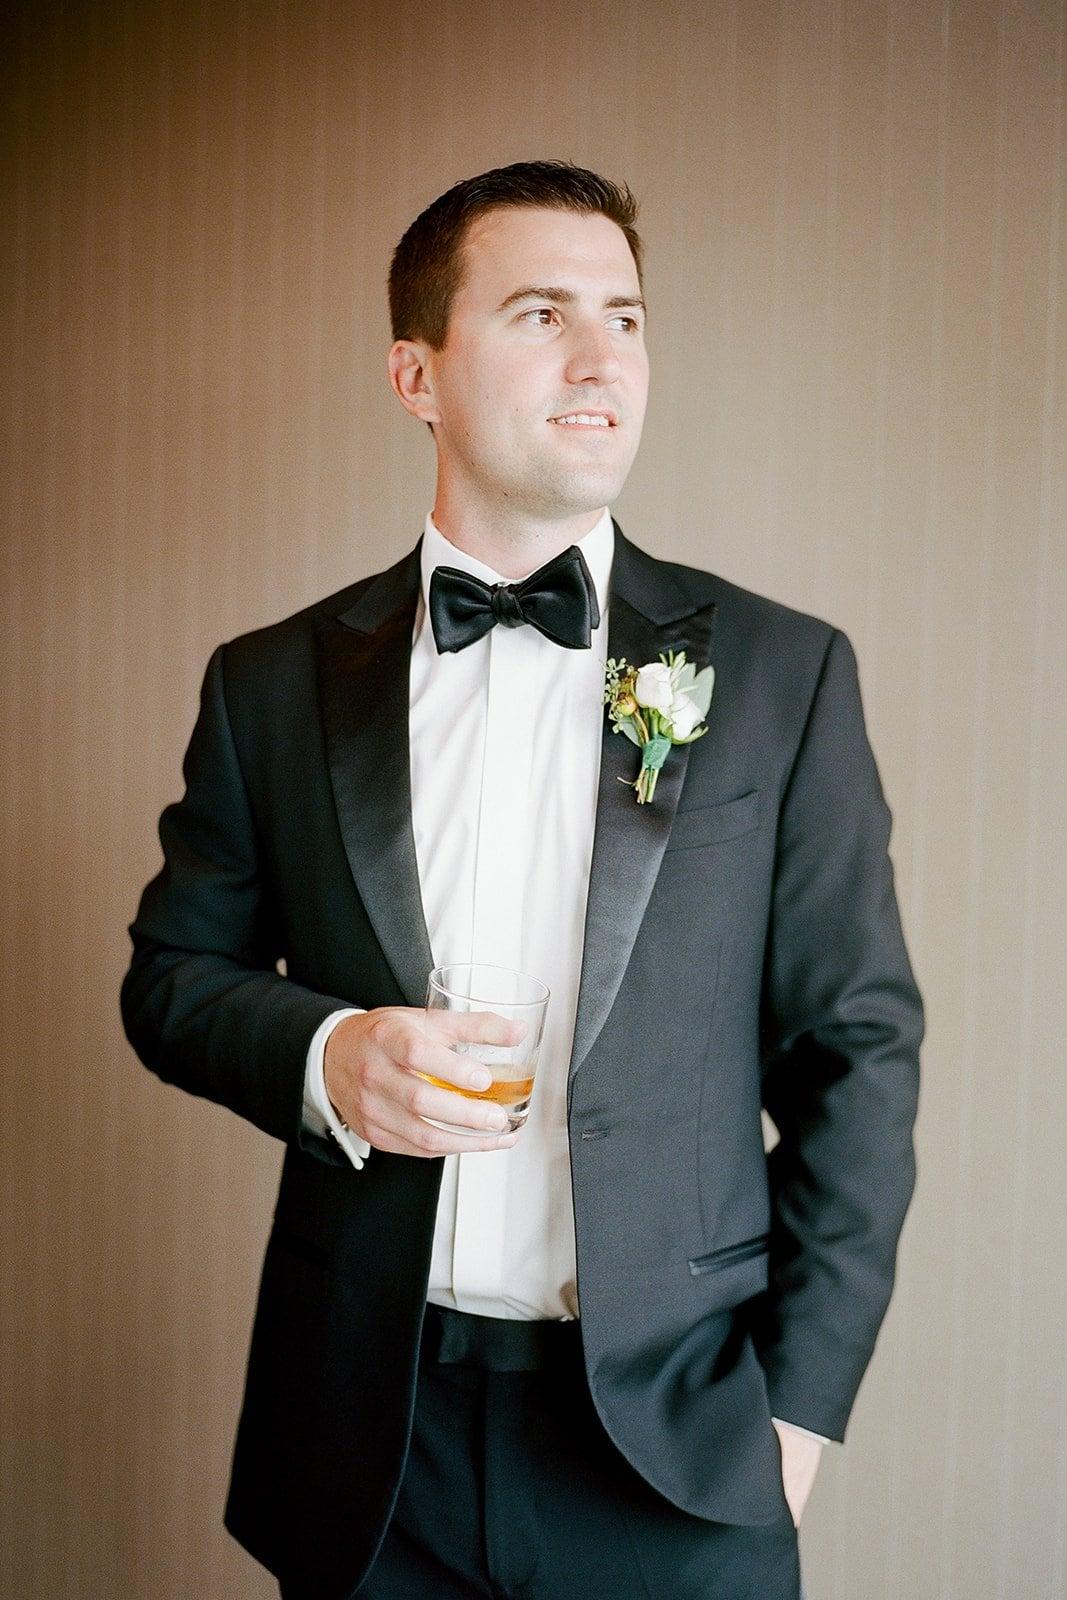 groom holding a scotch in a tuxedo